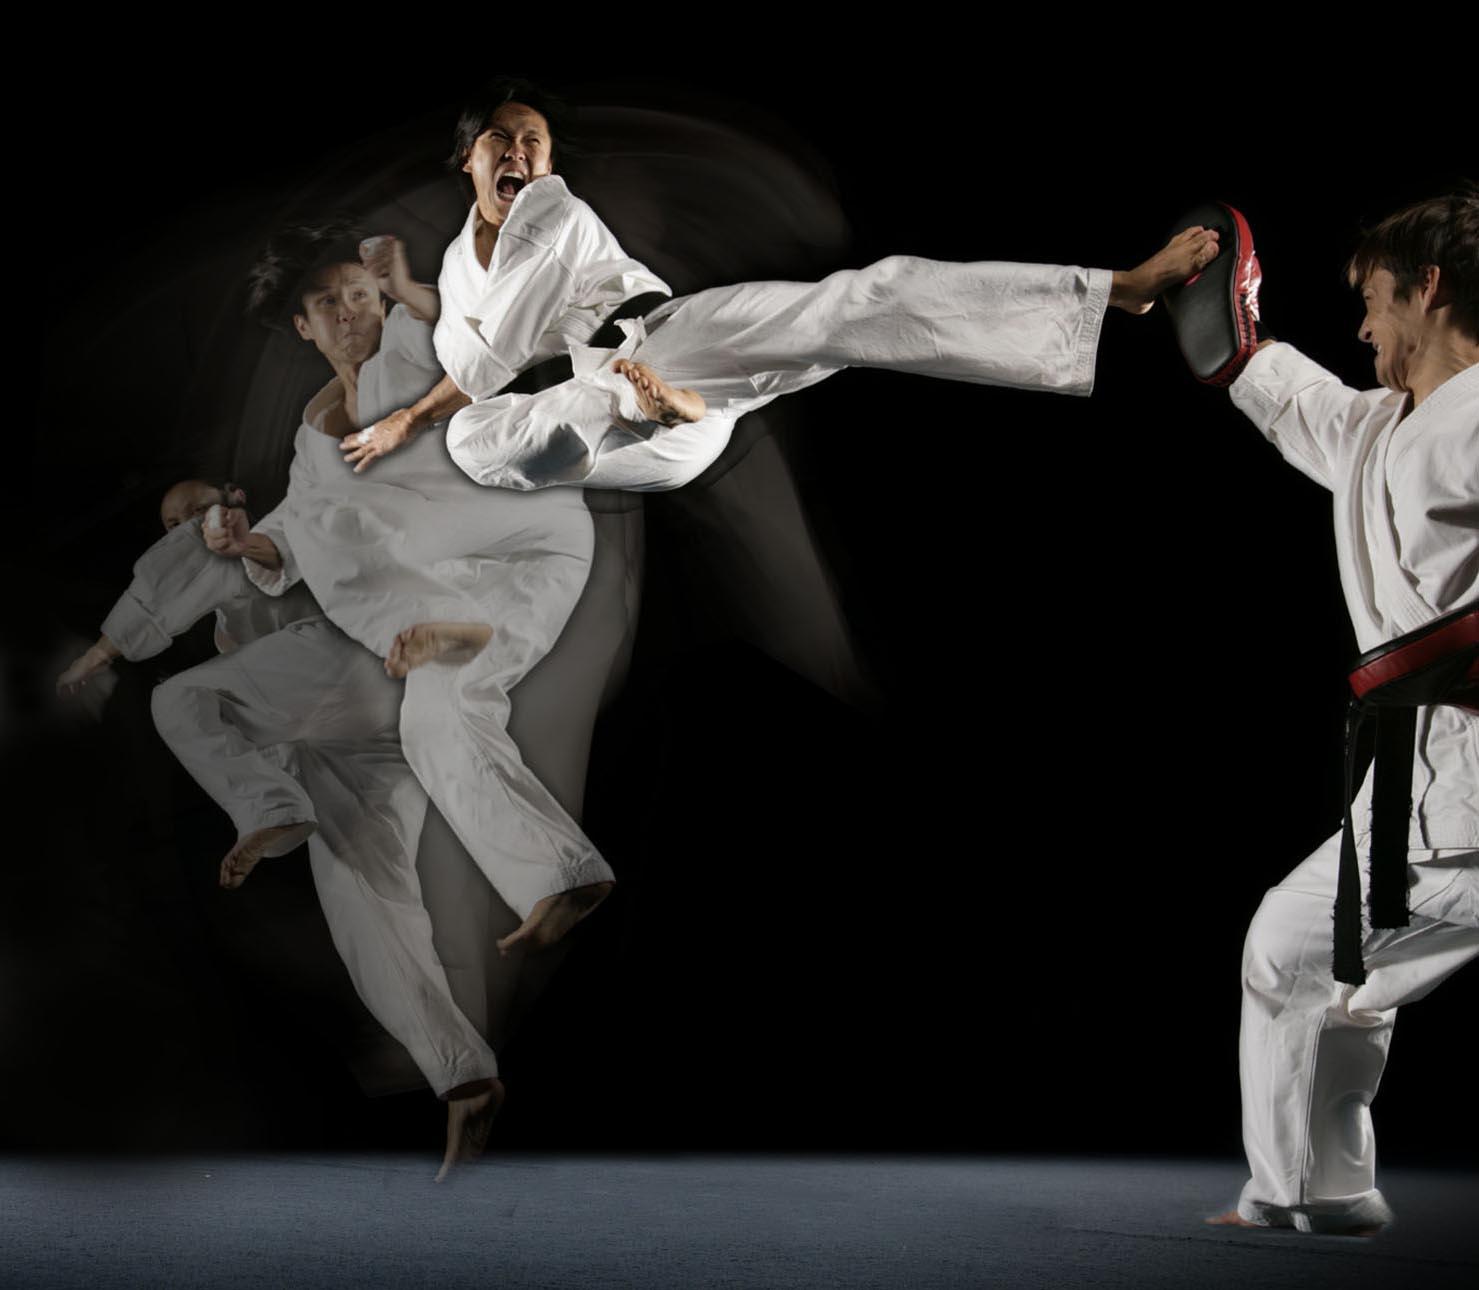 steven_ho_martial_arts_kick.jpg